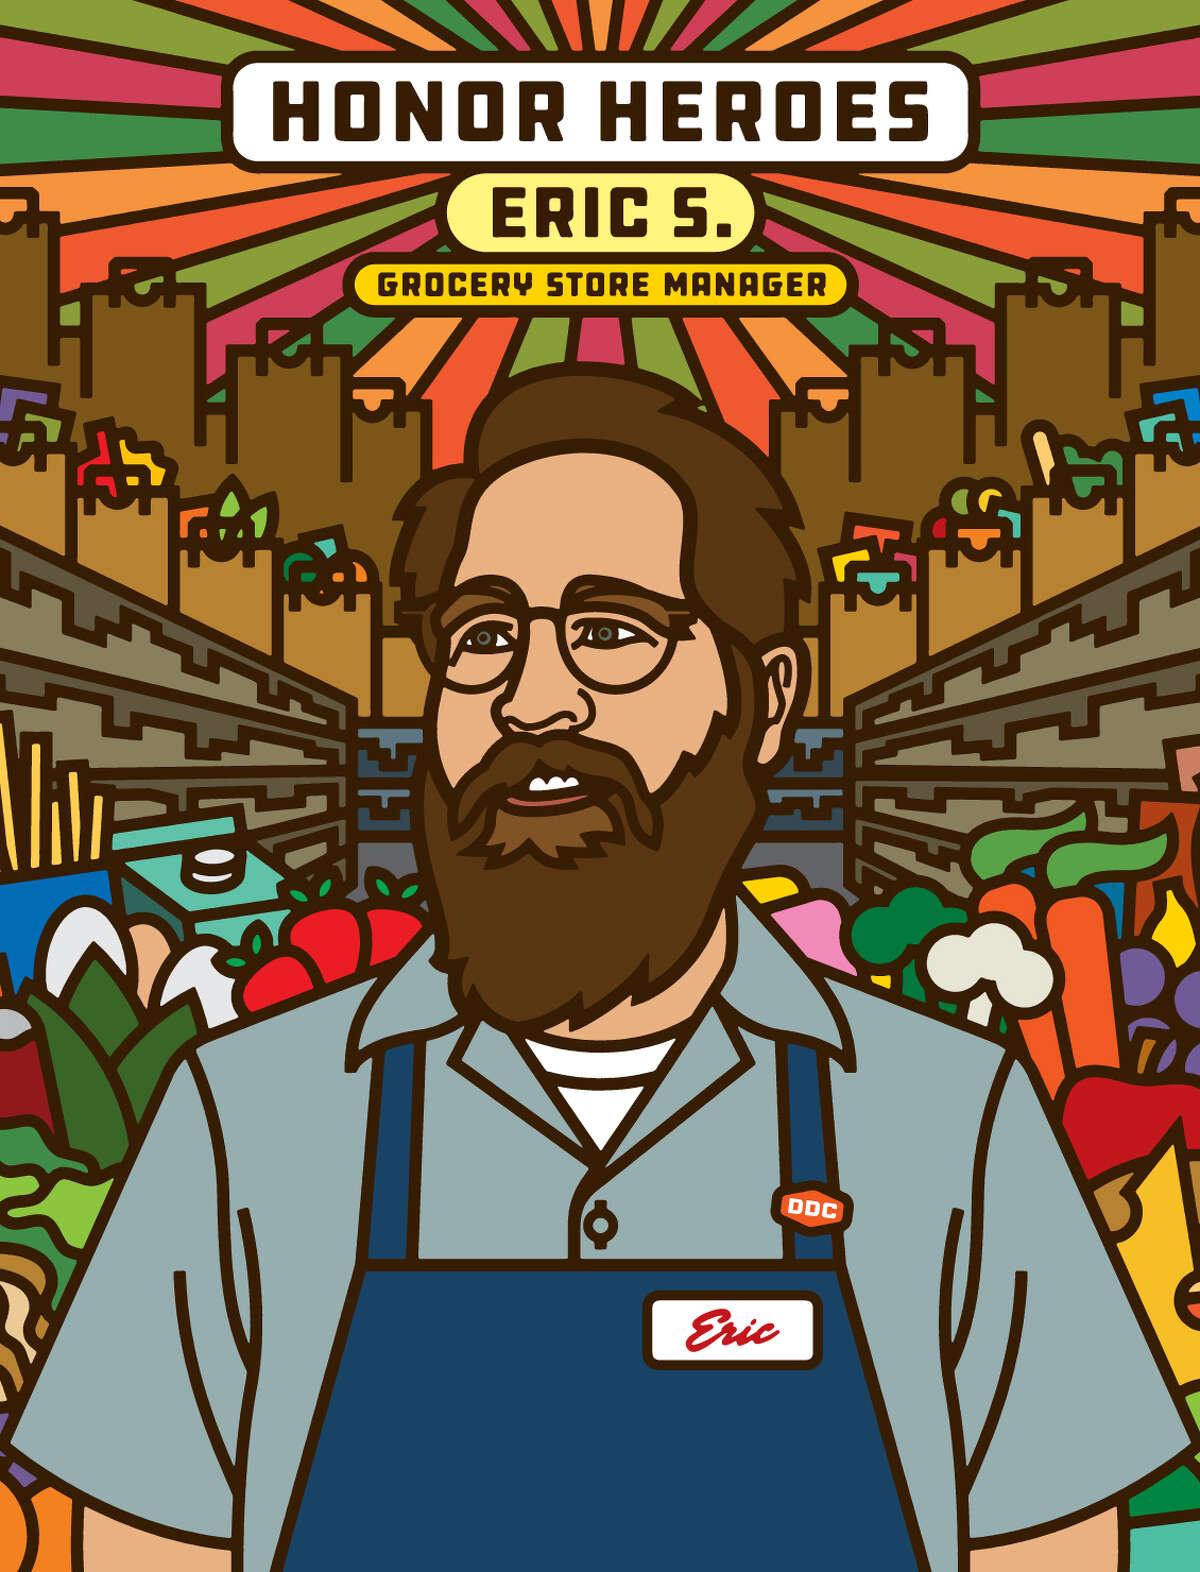 Heroes ArtistAaron DraplinHonoring: Grocery Store Mgr. Eric S. Creative artists such as Aaron Draplin, Donna Adi, Jessica Walsh and Ignasi Monreal -